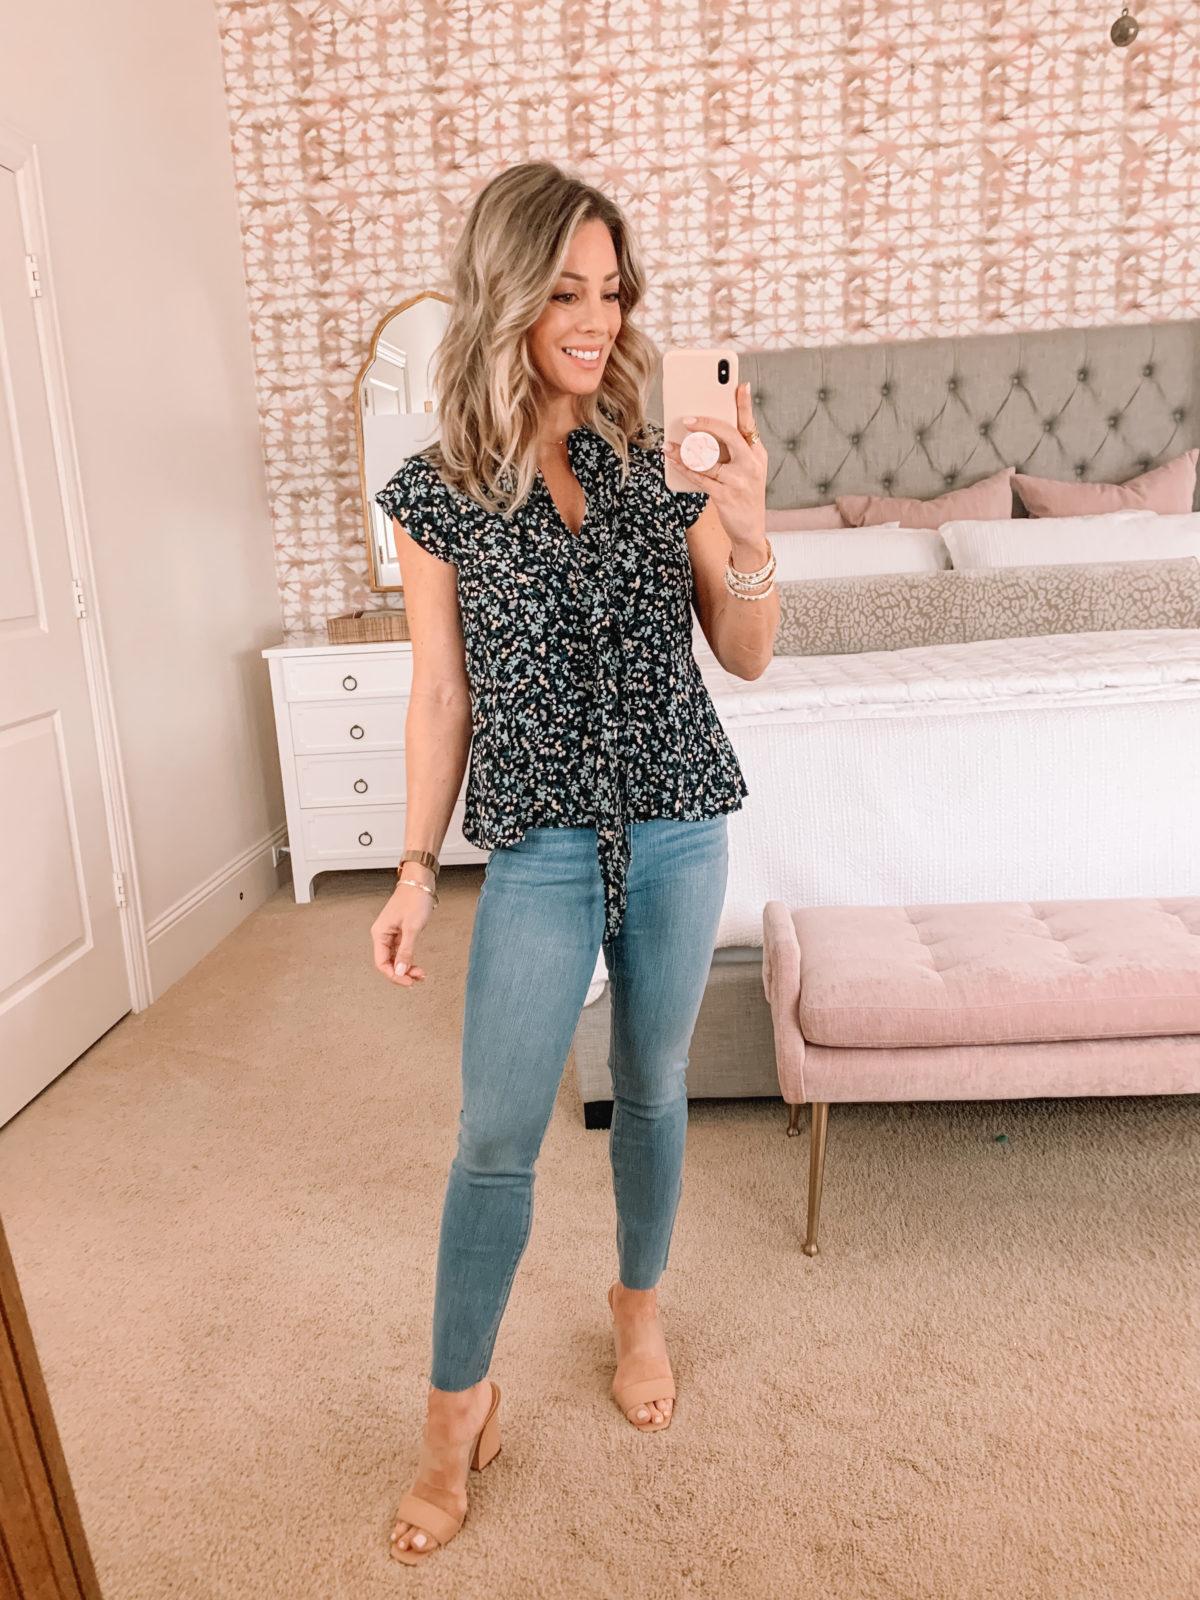 Dressing Room, Floral Top, Jeans, Nude Sandals